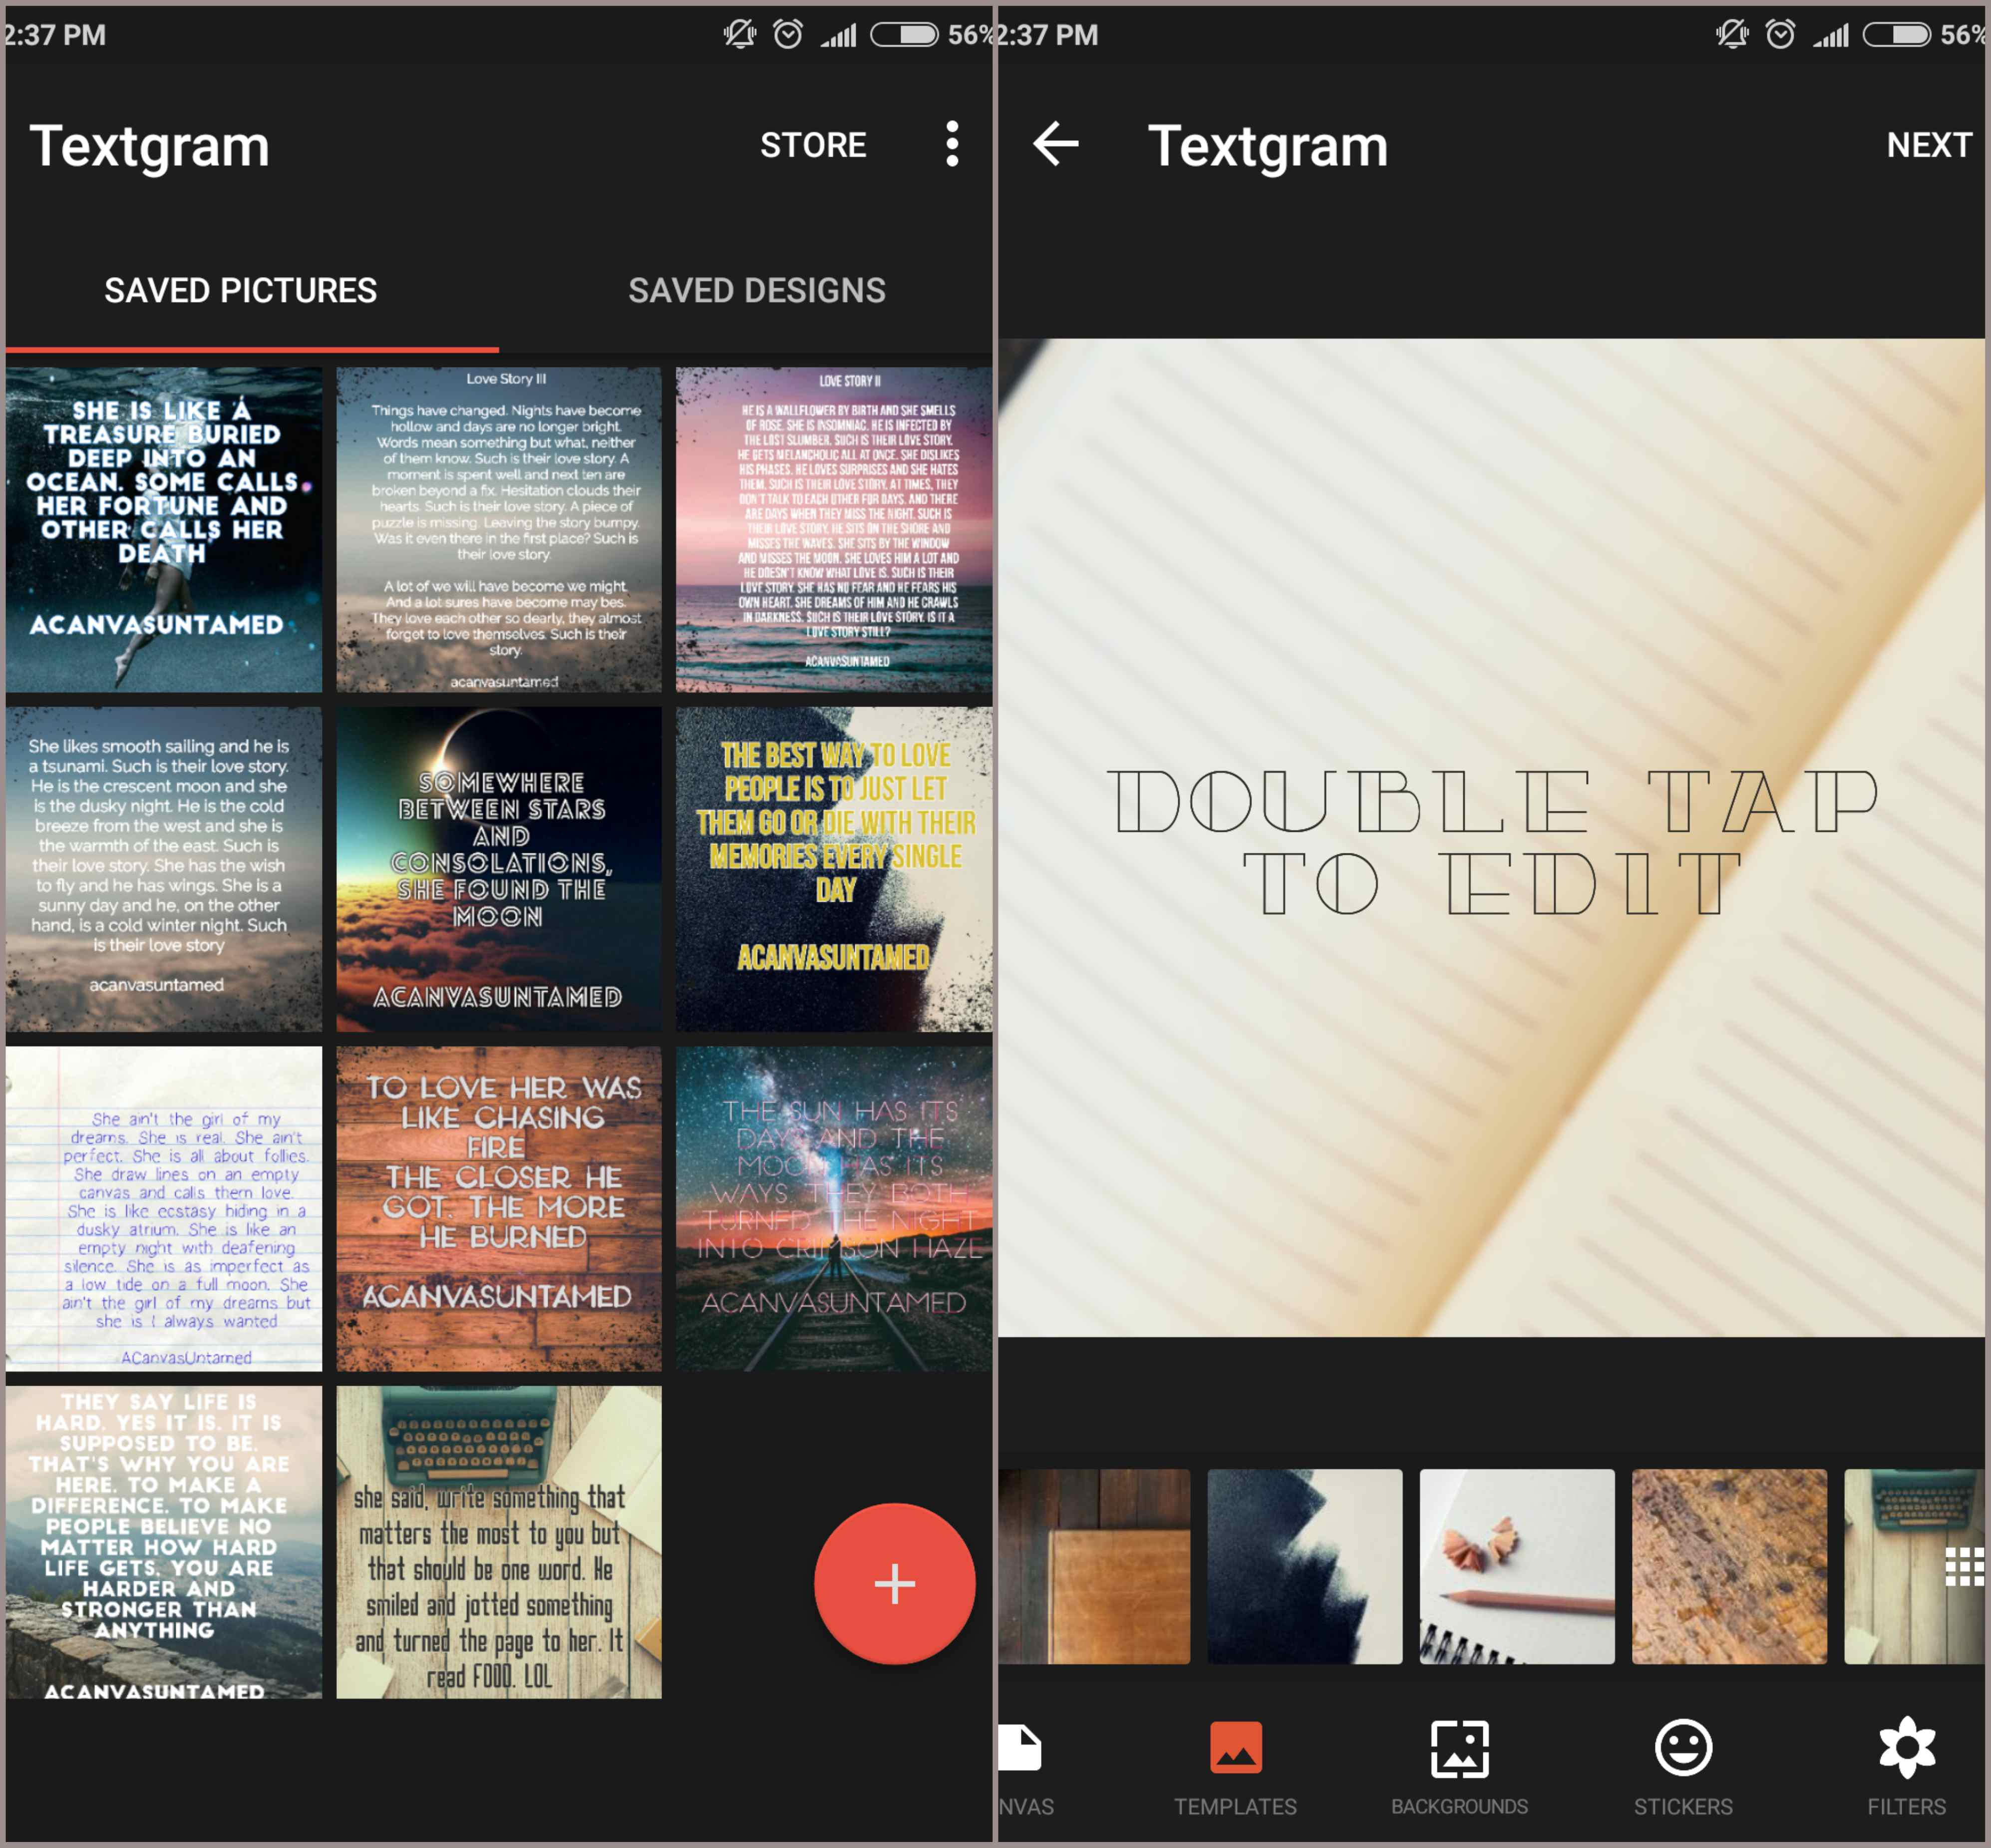 textgram app